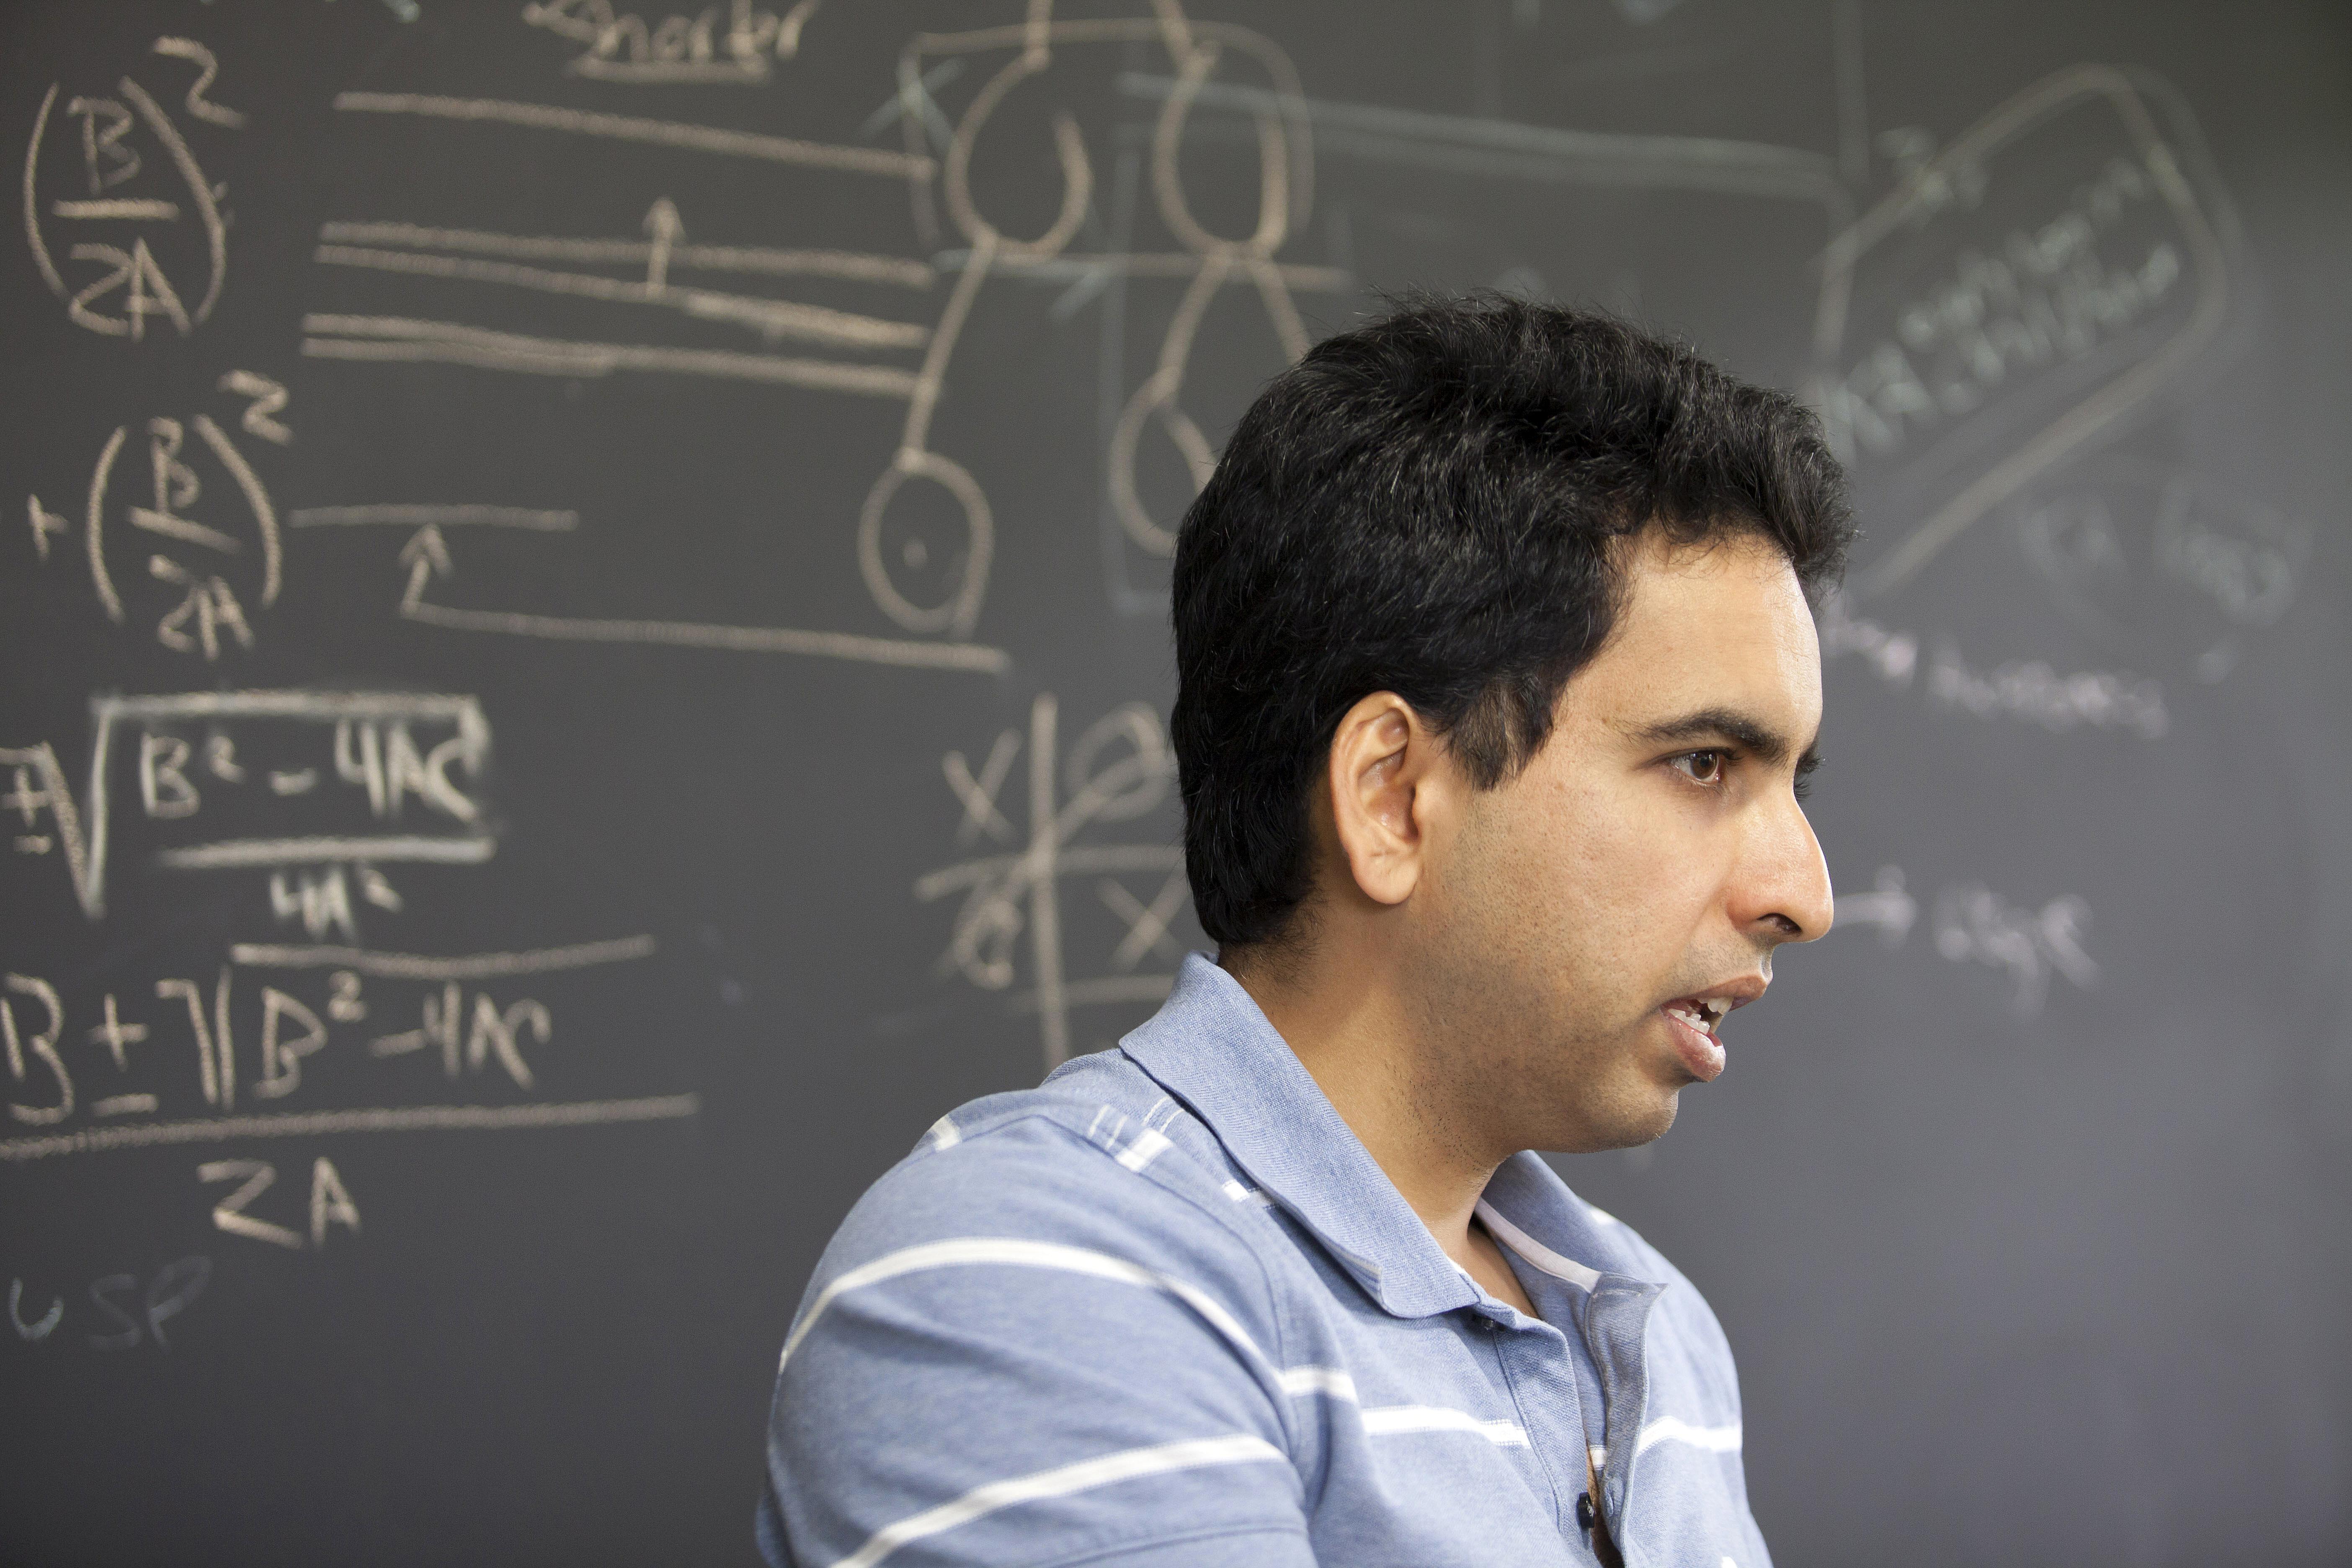 Portrait of Salman Khan, the founder of the Khan Academy